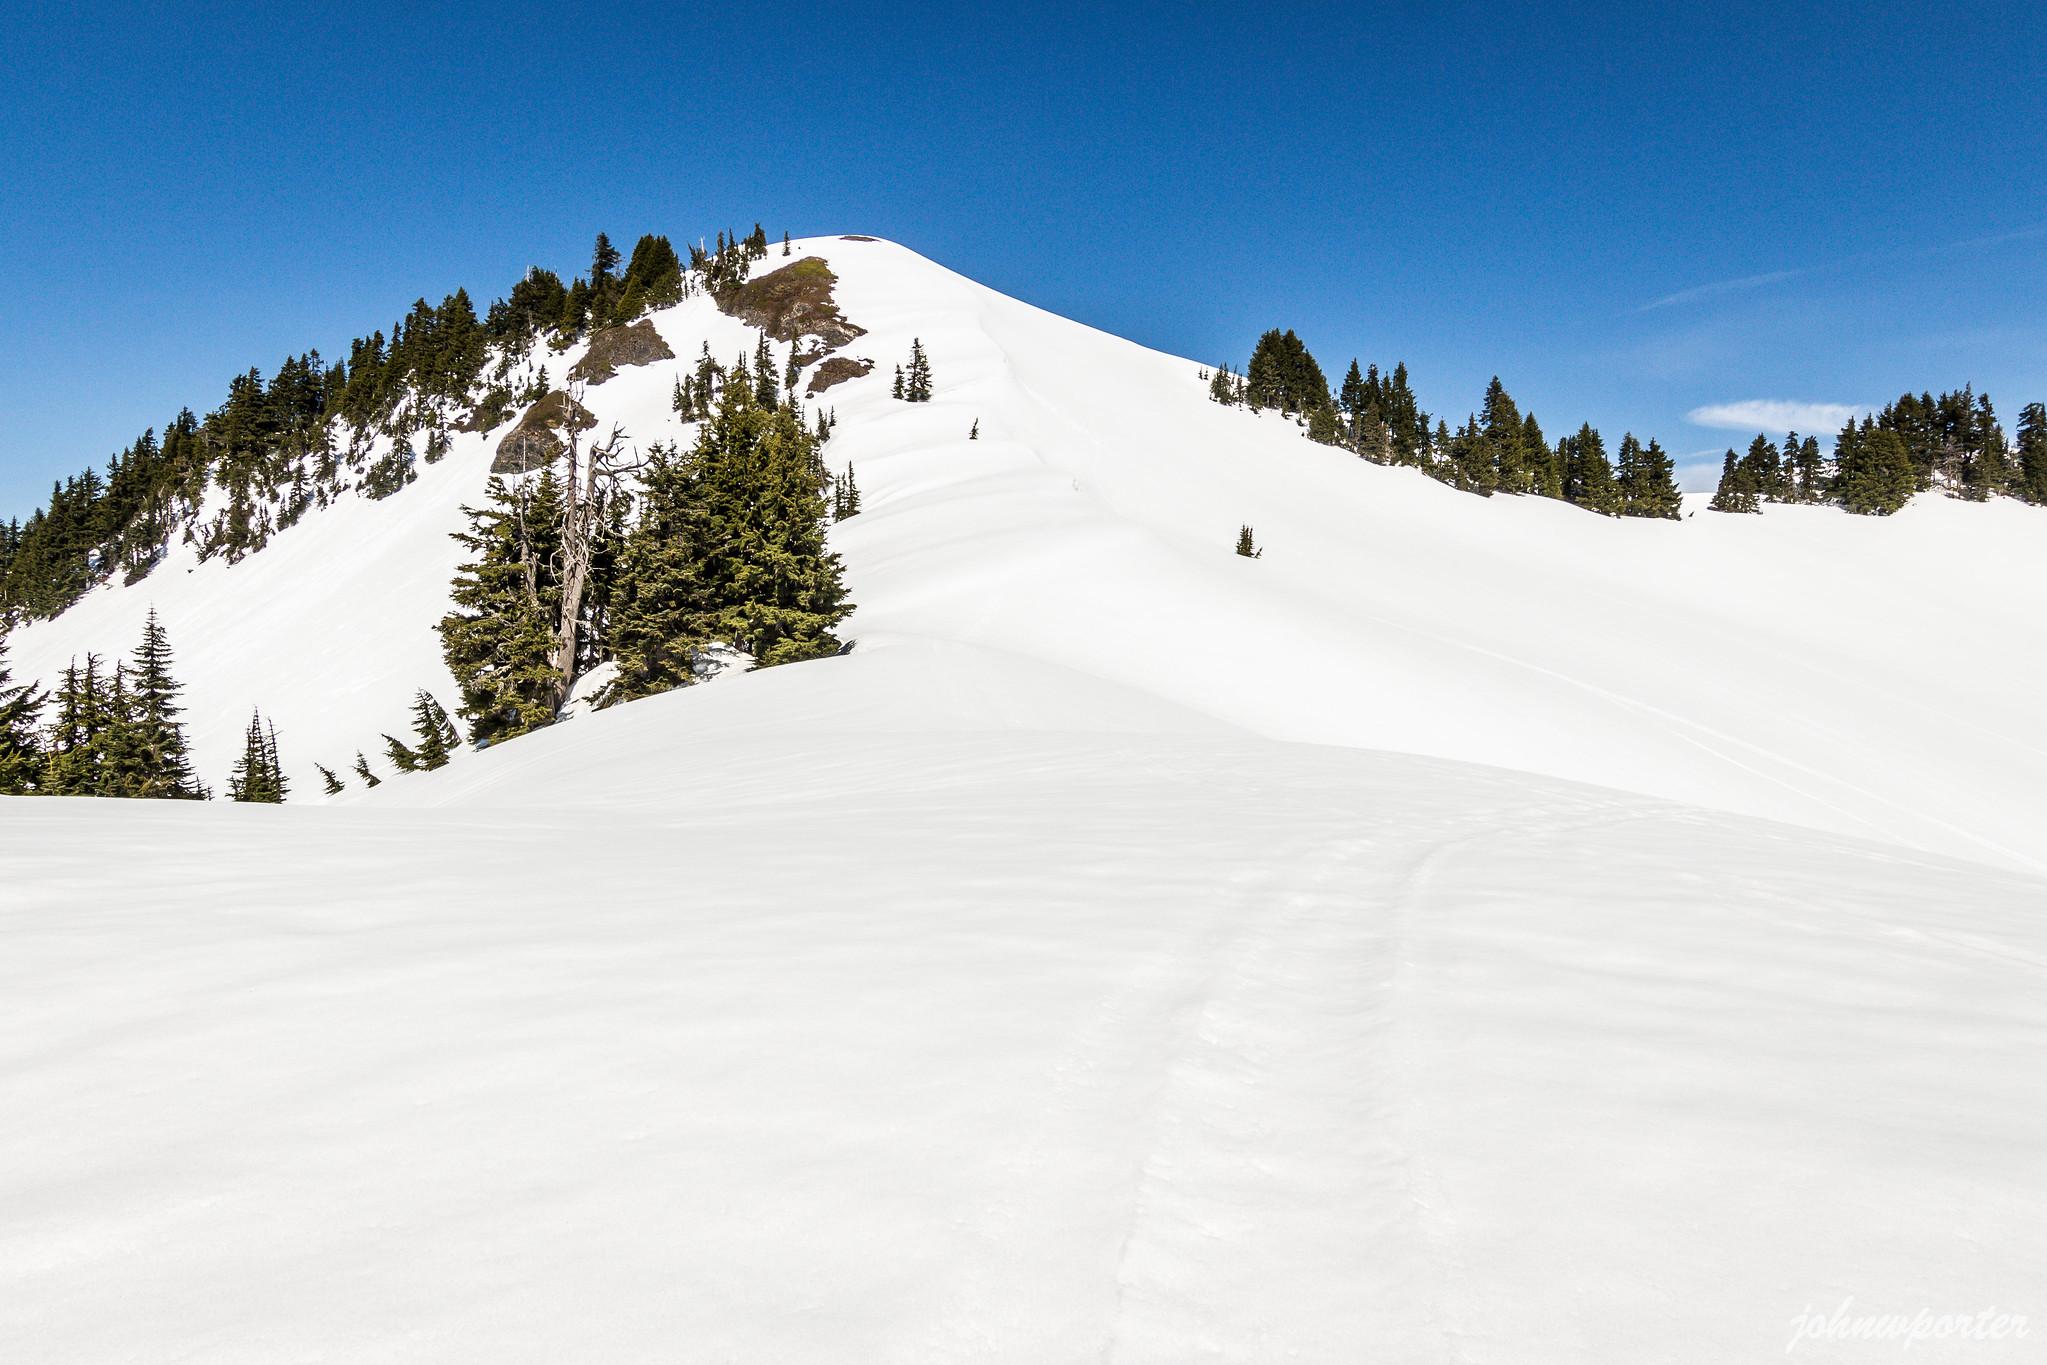 The last 300 feet to Excelsior Peak